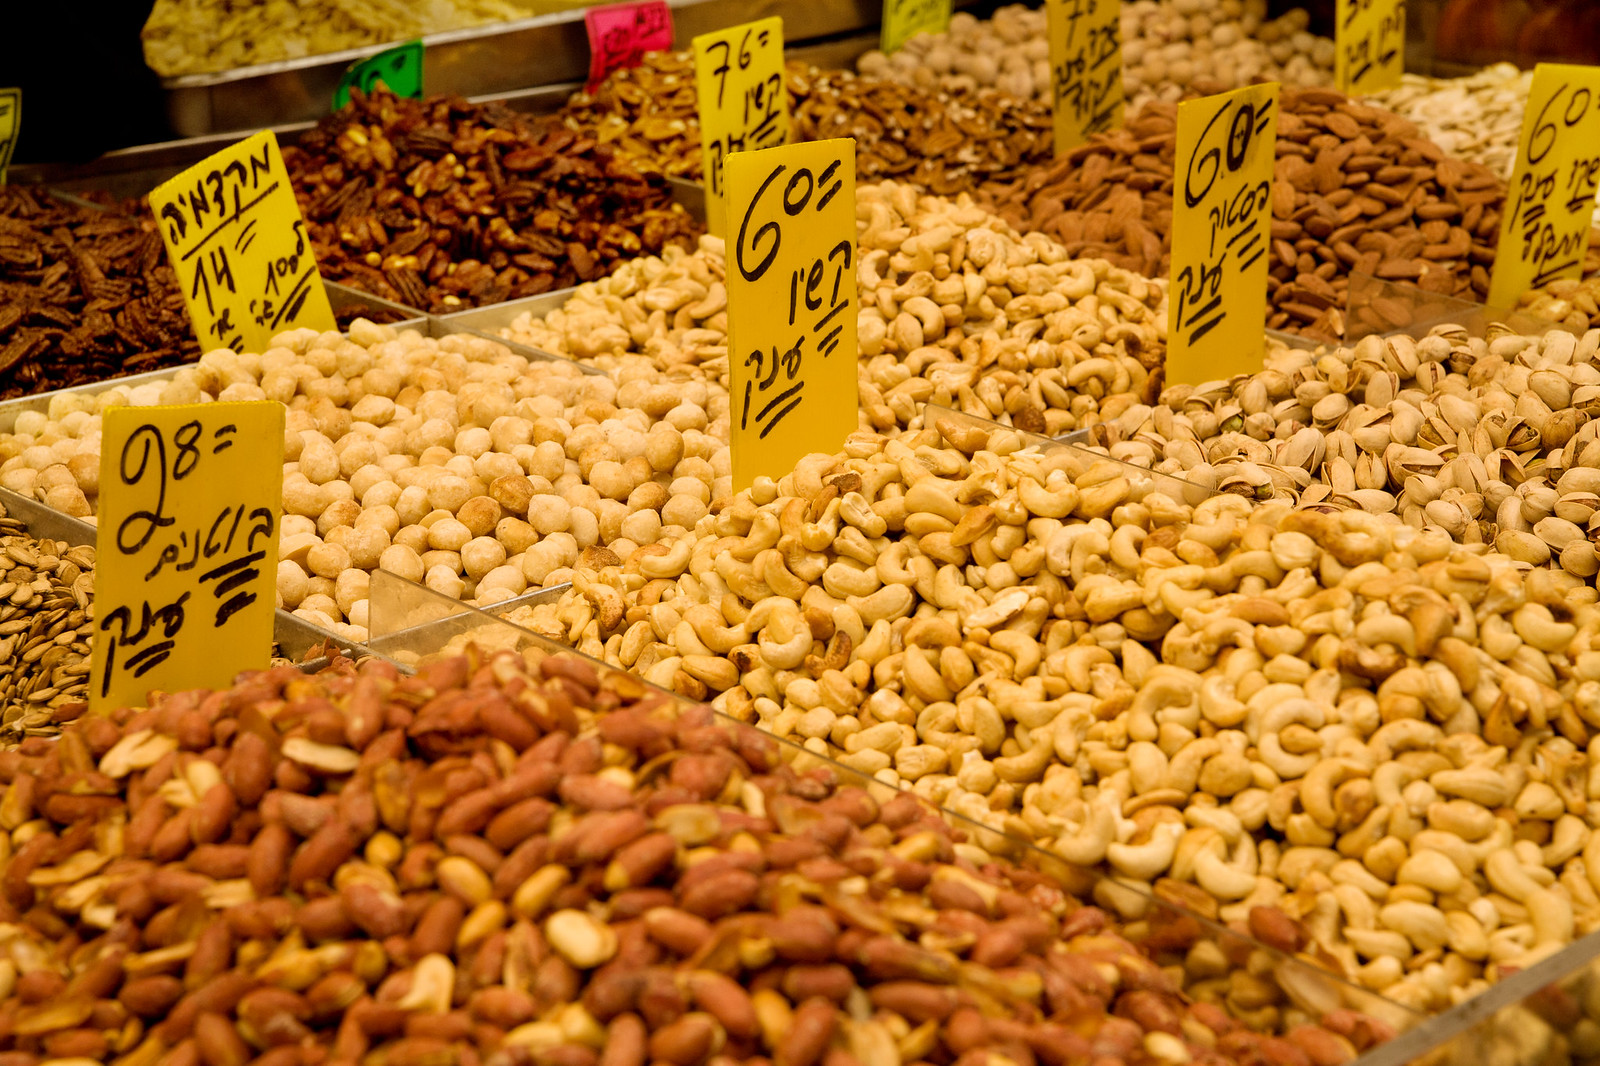 Jerusalem_Mahane Yehuda Market_5_Noam Chen_IMOT